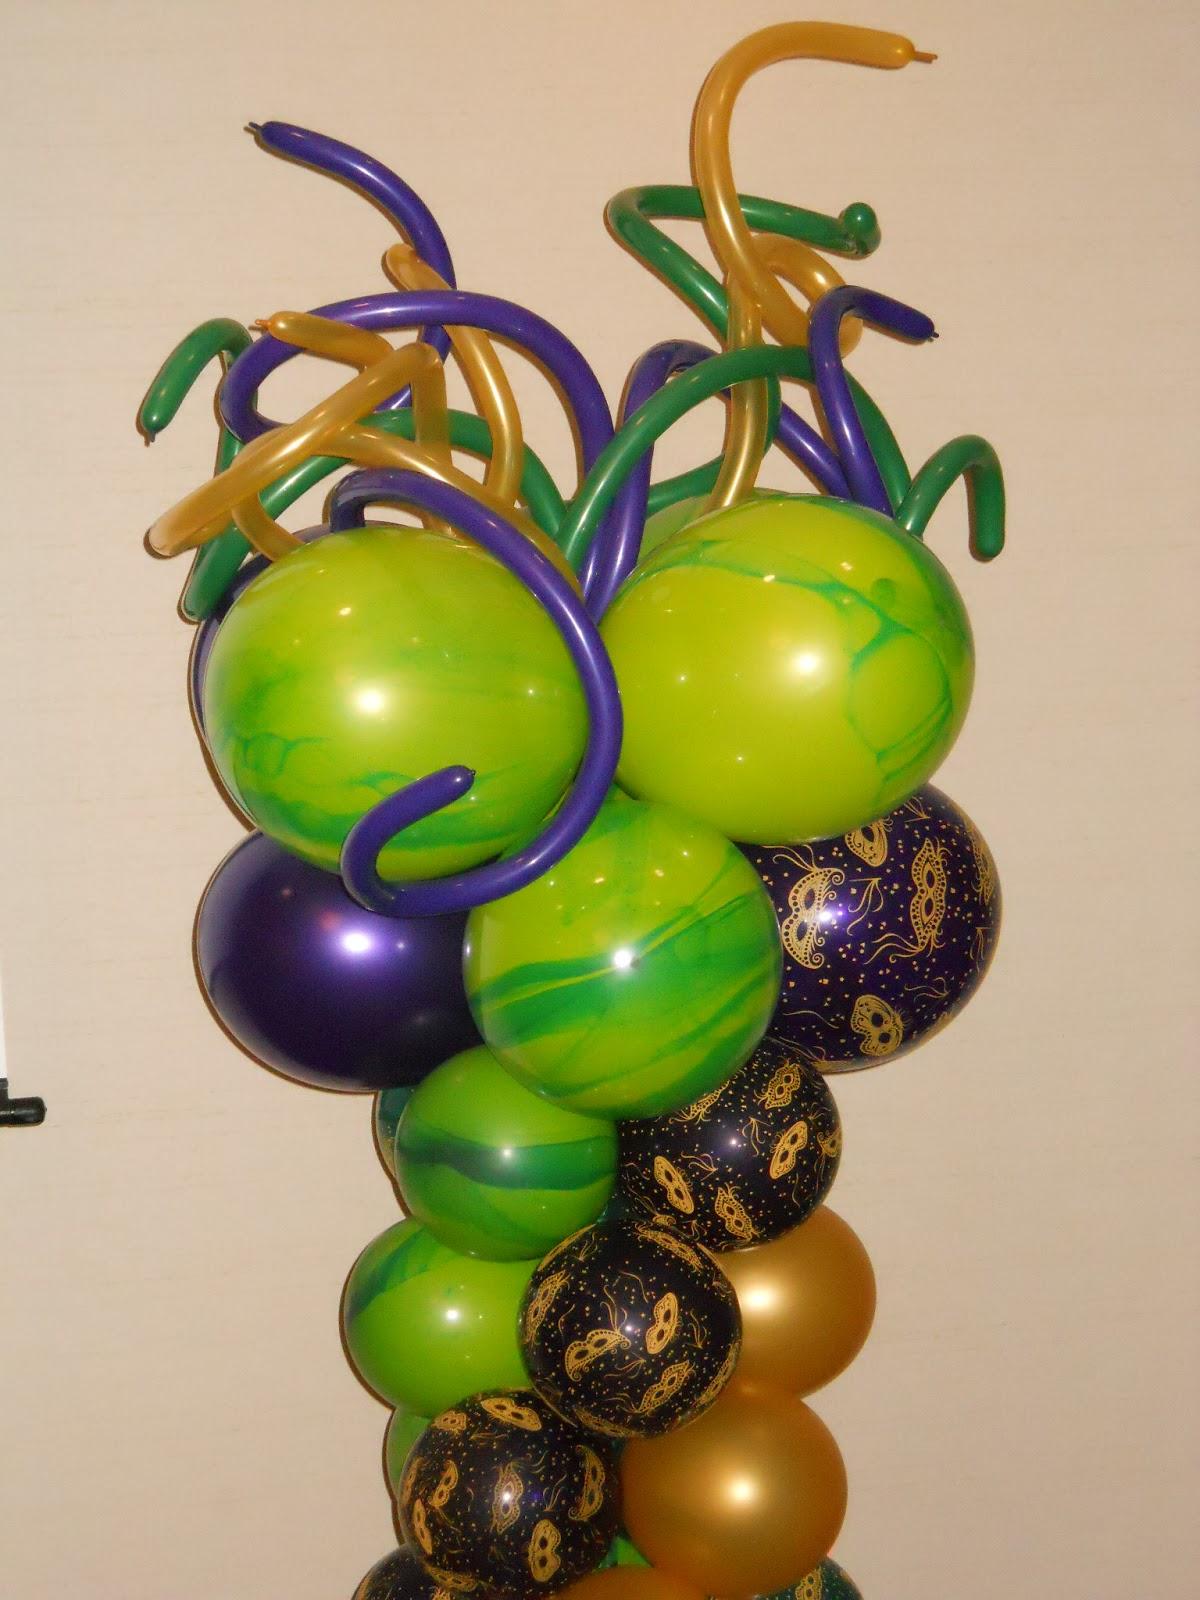 Mardi Gras Decorations Ideas